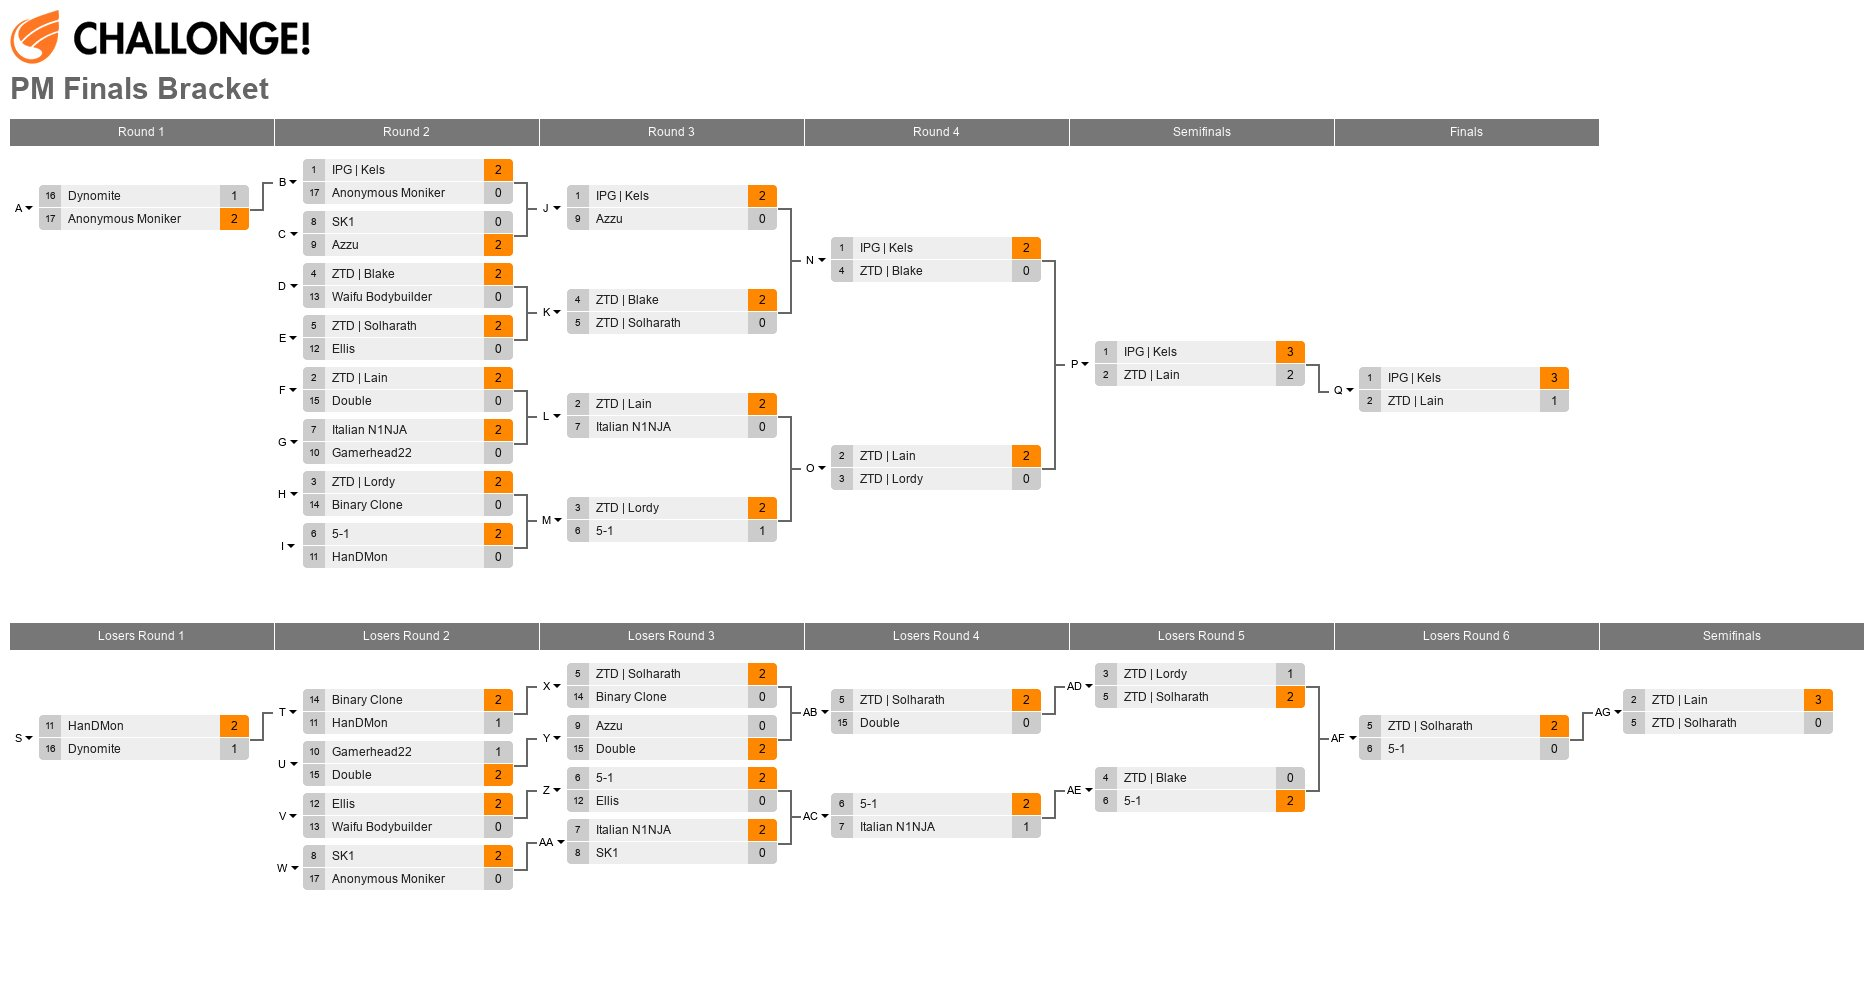 E2C 11 PM Finals Bracket